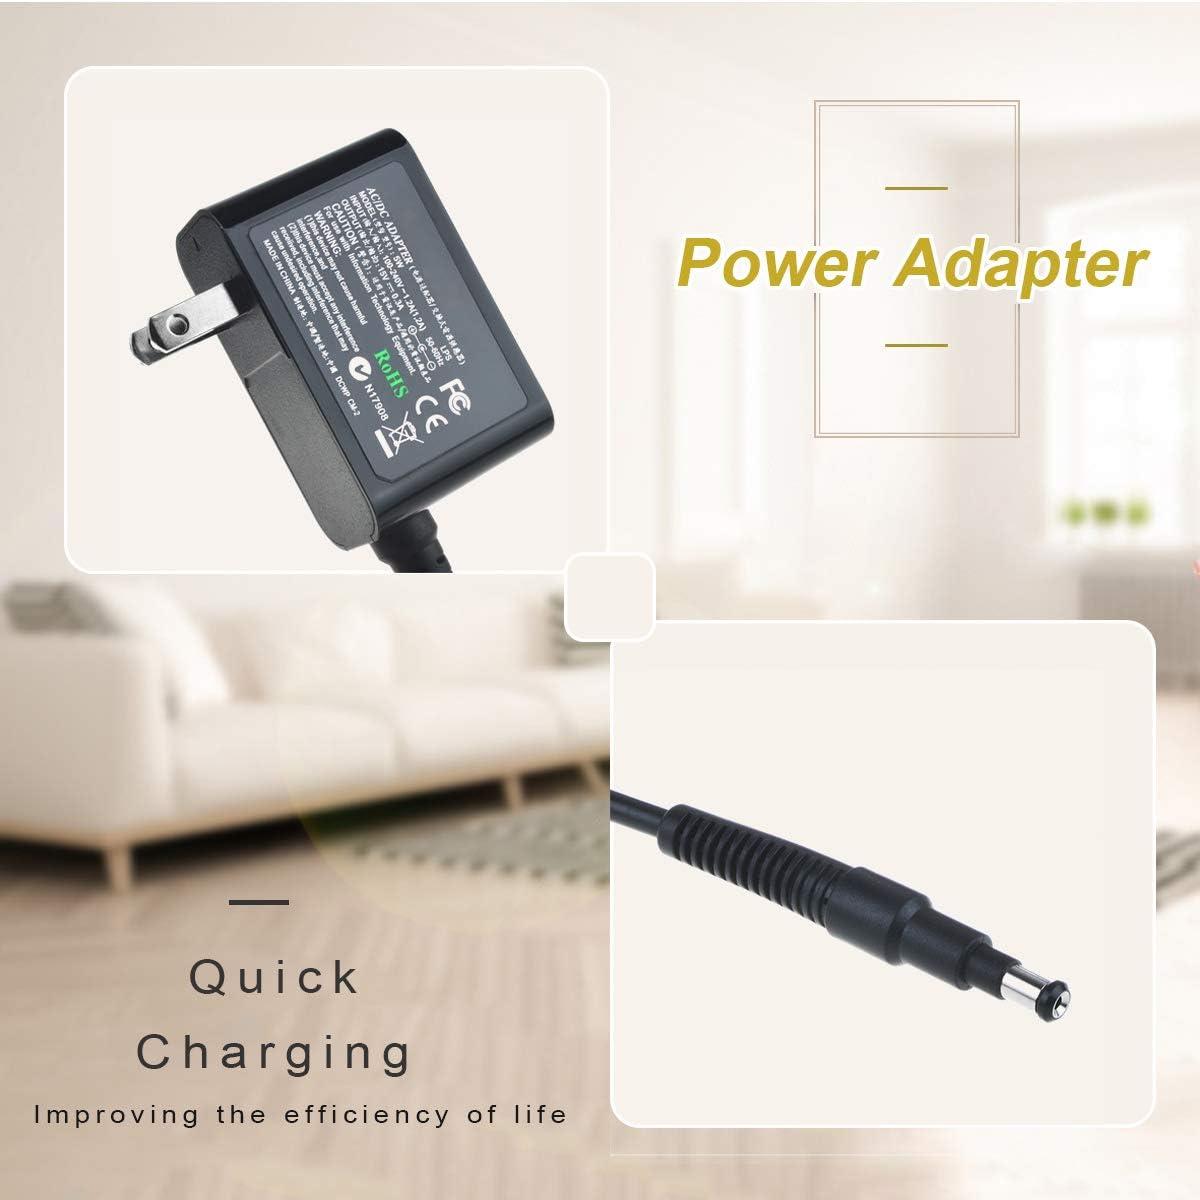 TOP DC Adapter for Fluke ScopeMeters 90 Series 105 99 98 97 96 95 93 92 91